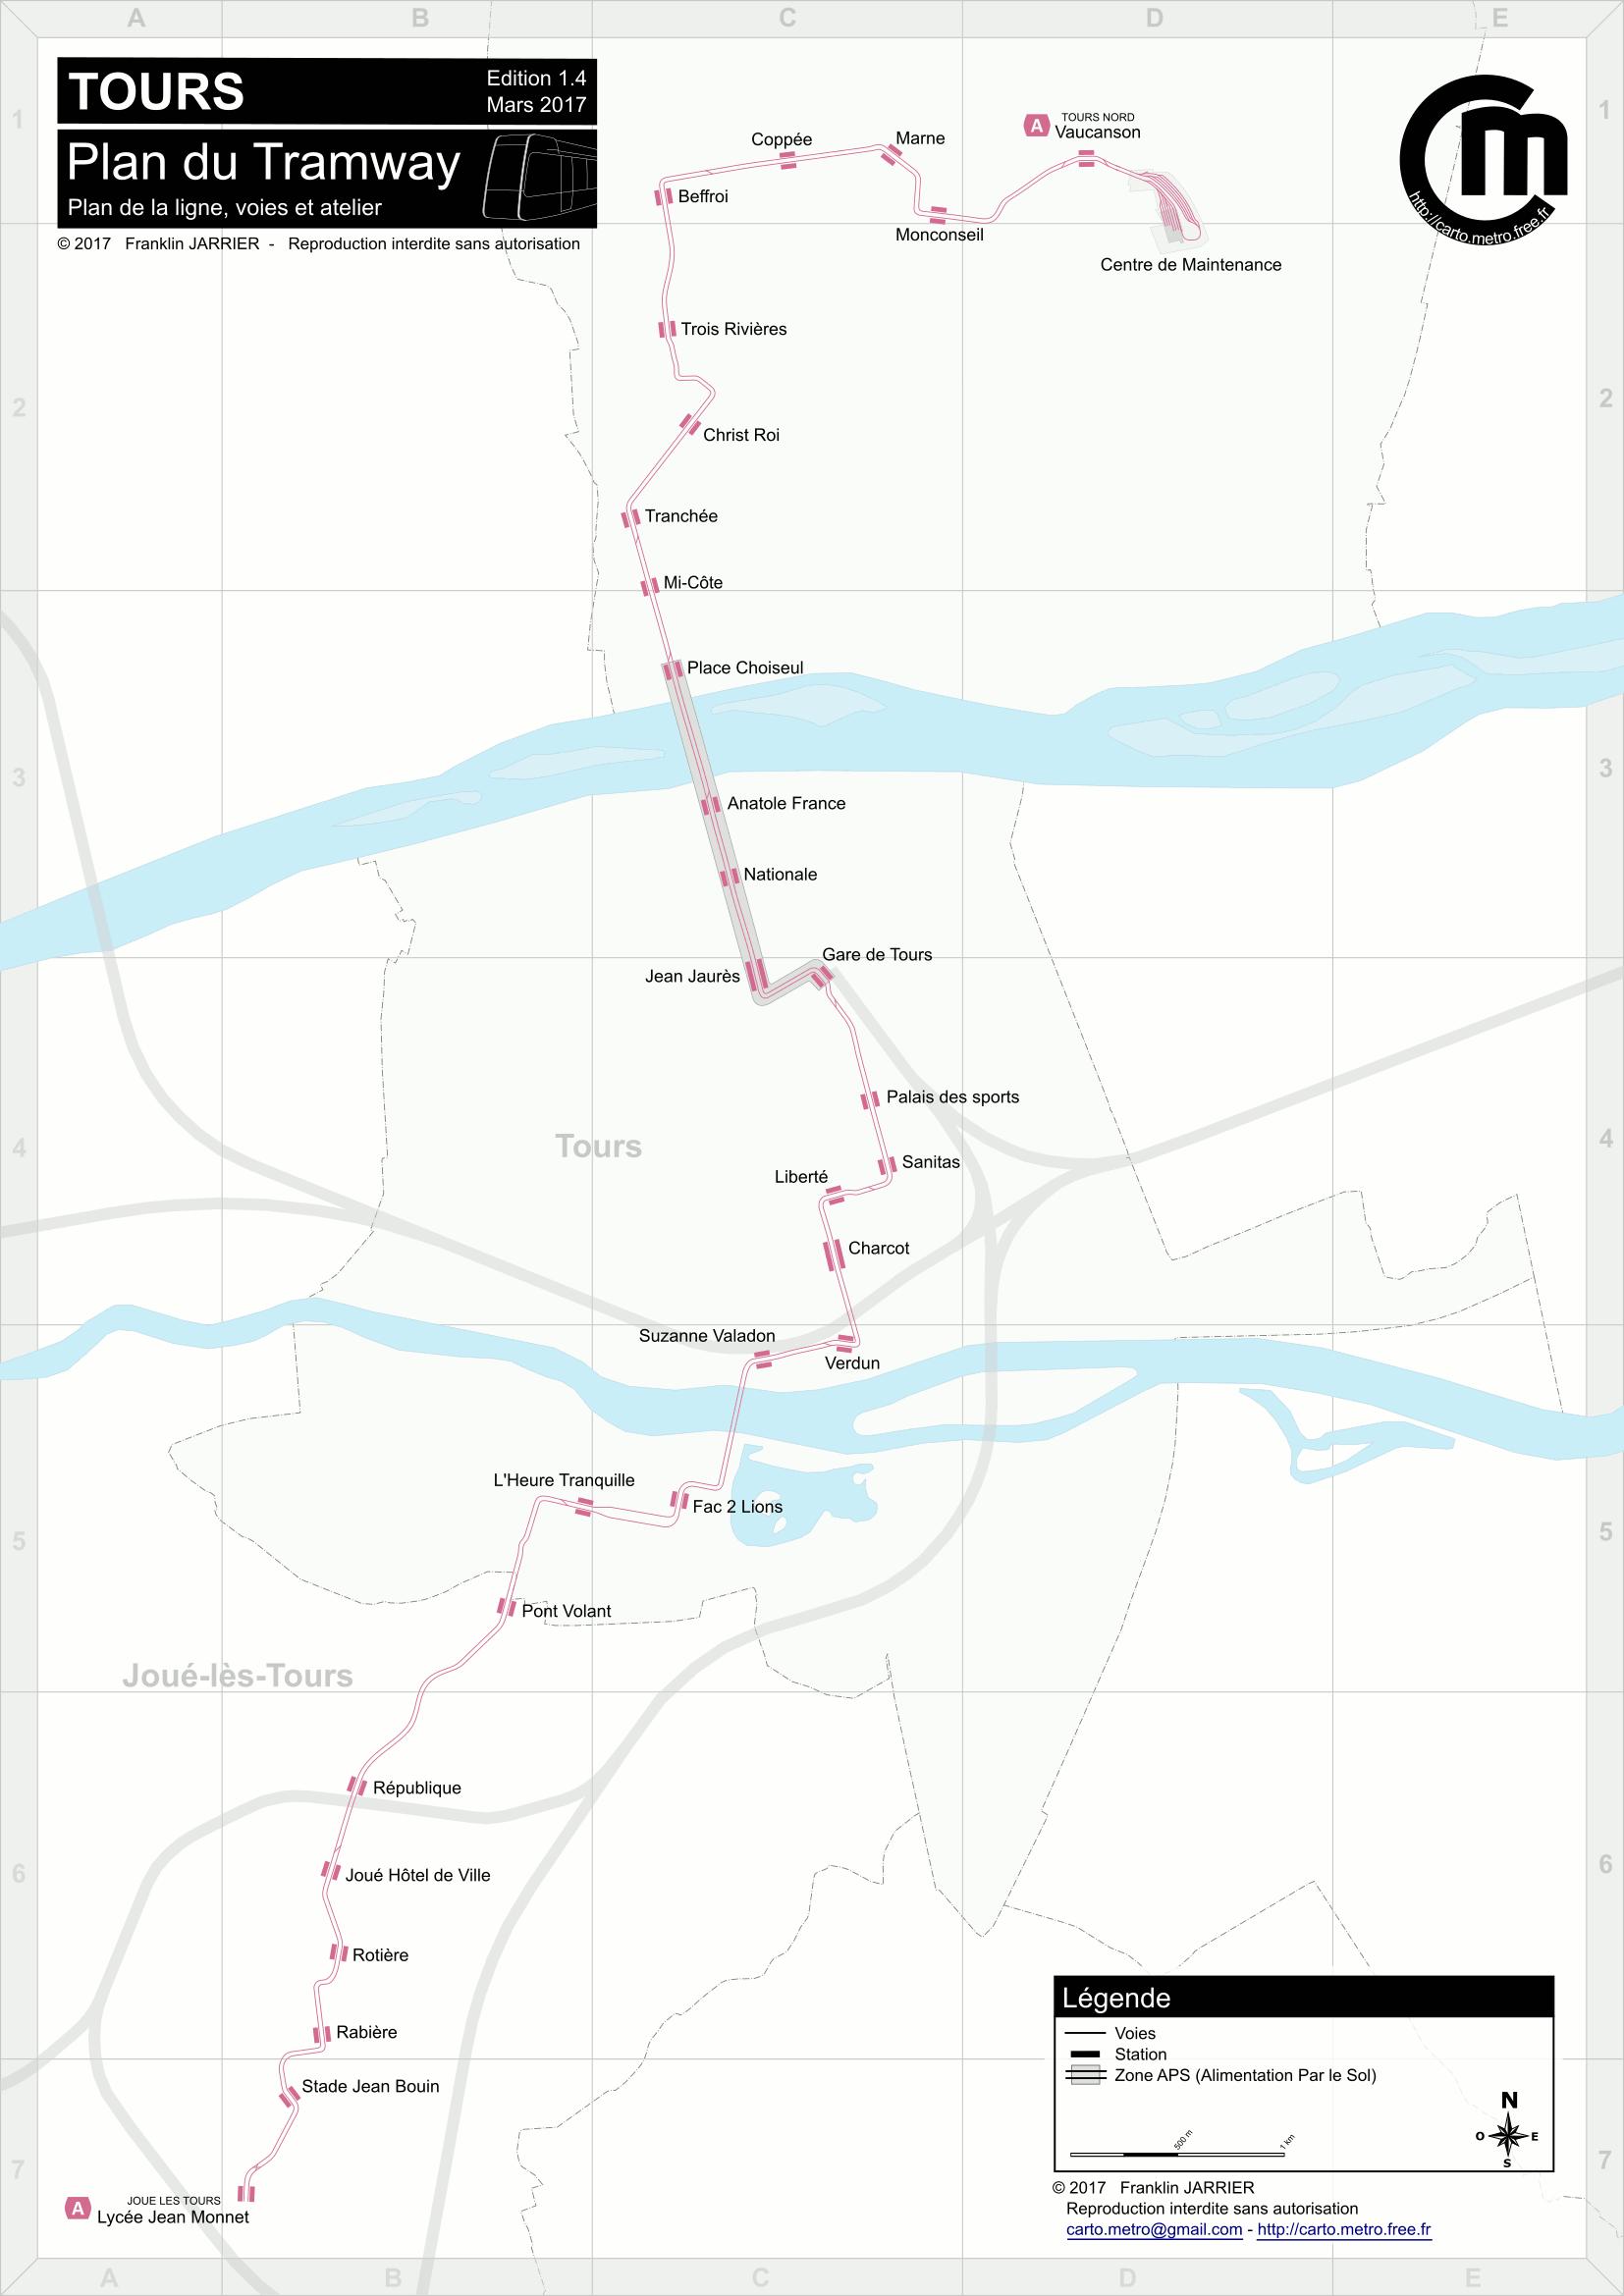 Map Of France Pdf.Detailled Tracks Map Paris Lyon Lausanne Milan Turin Tracks Maps